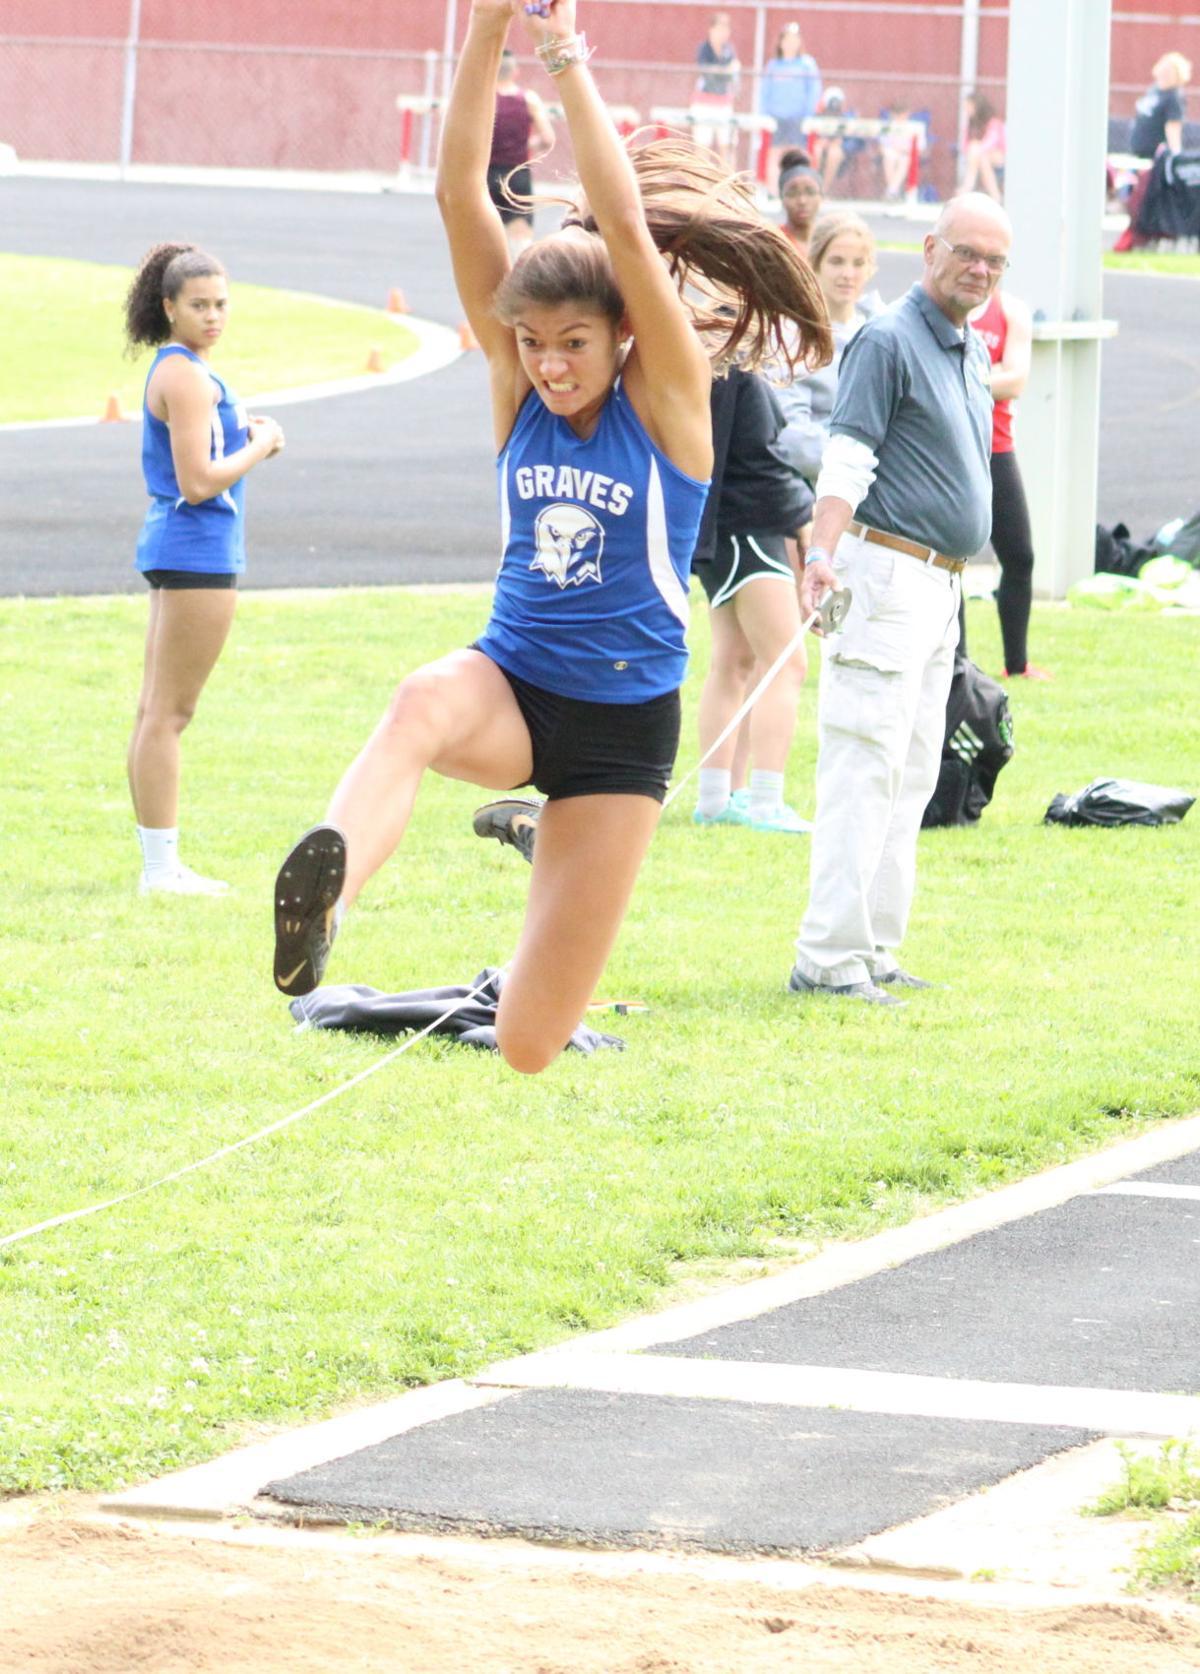 Galloway wins 100M hurdles, long jump, triple jump